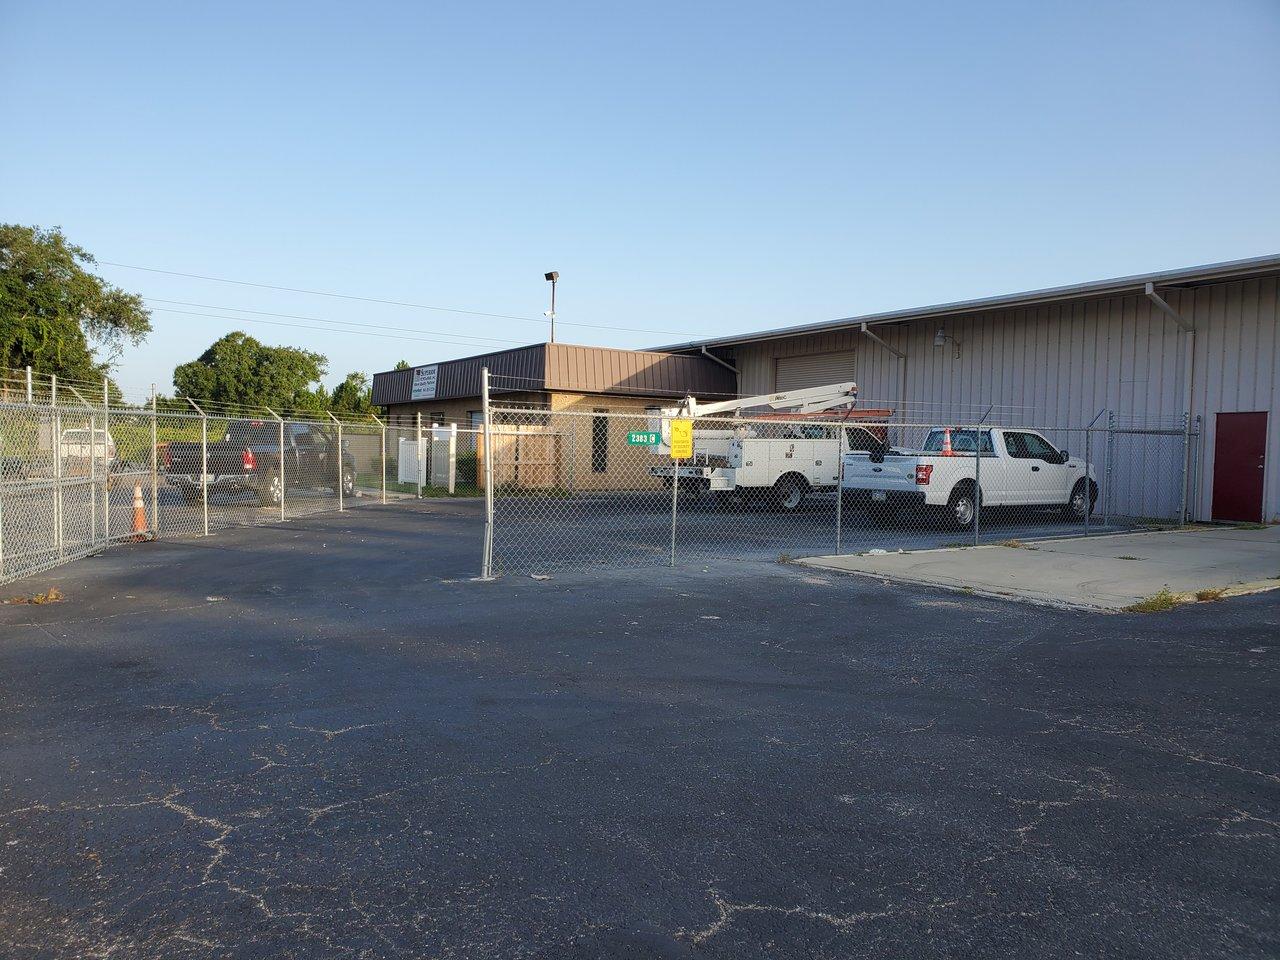 2383 Industrial Blvd, Sarasota, FL, 34234